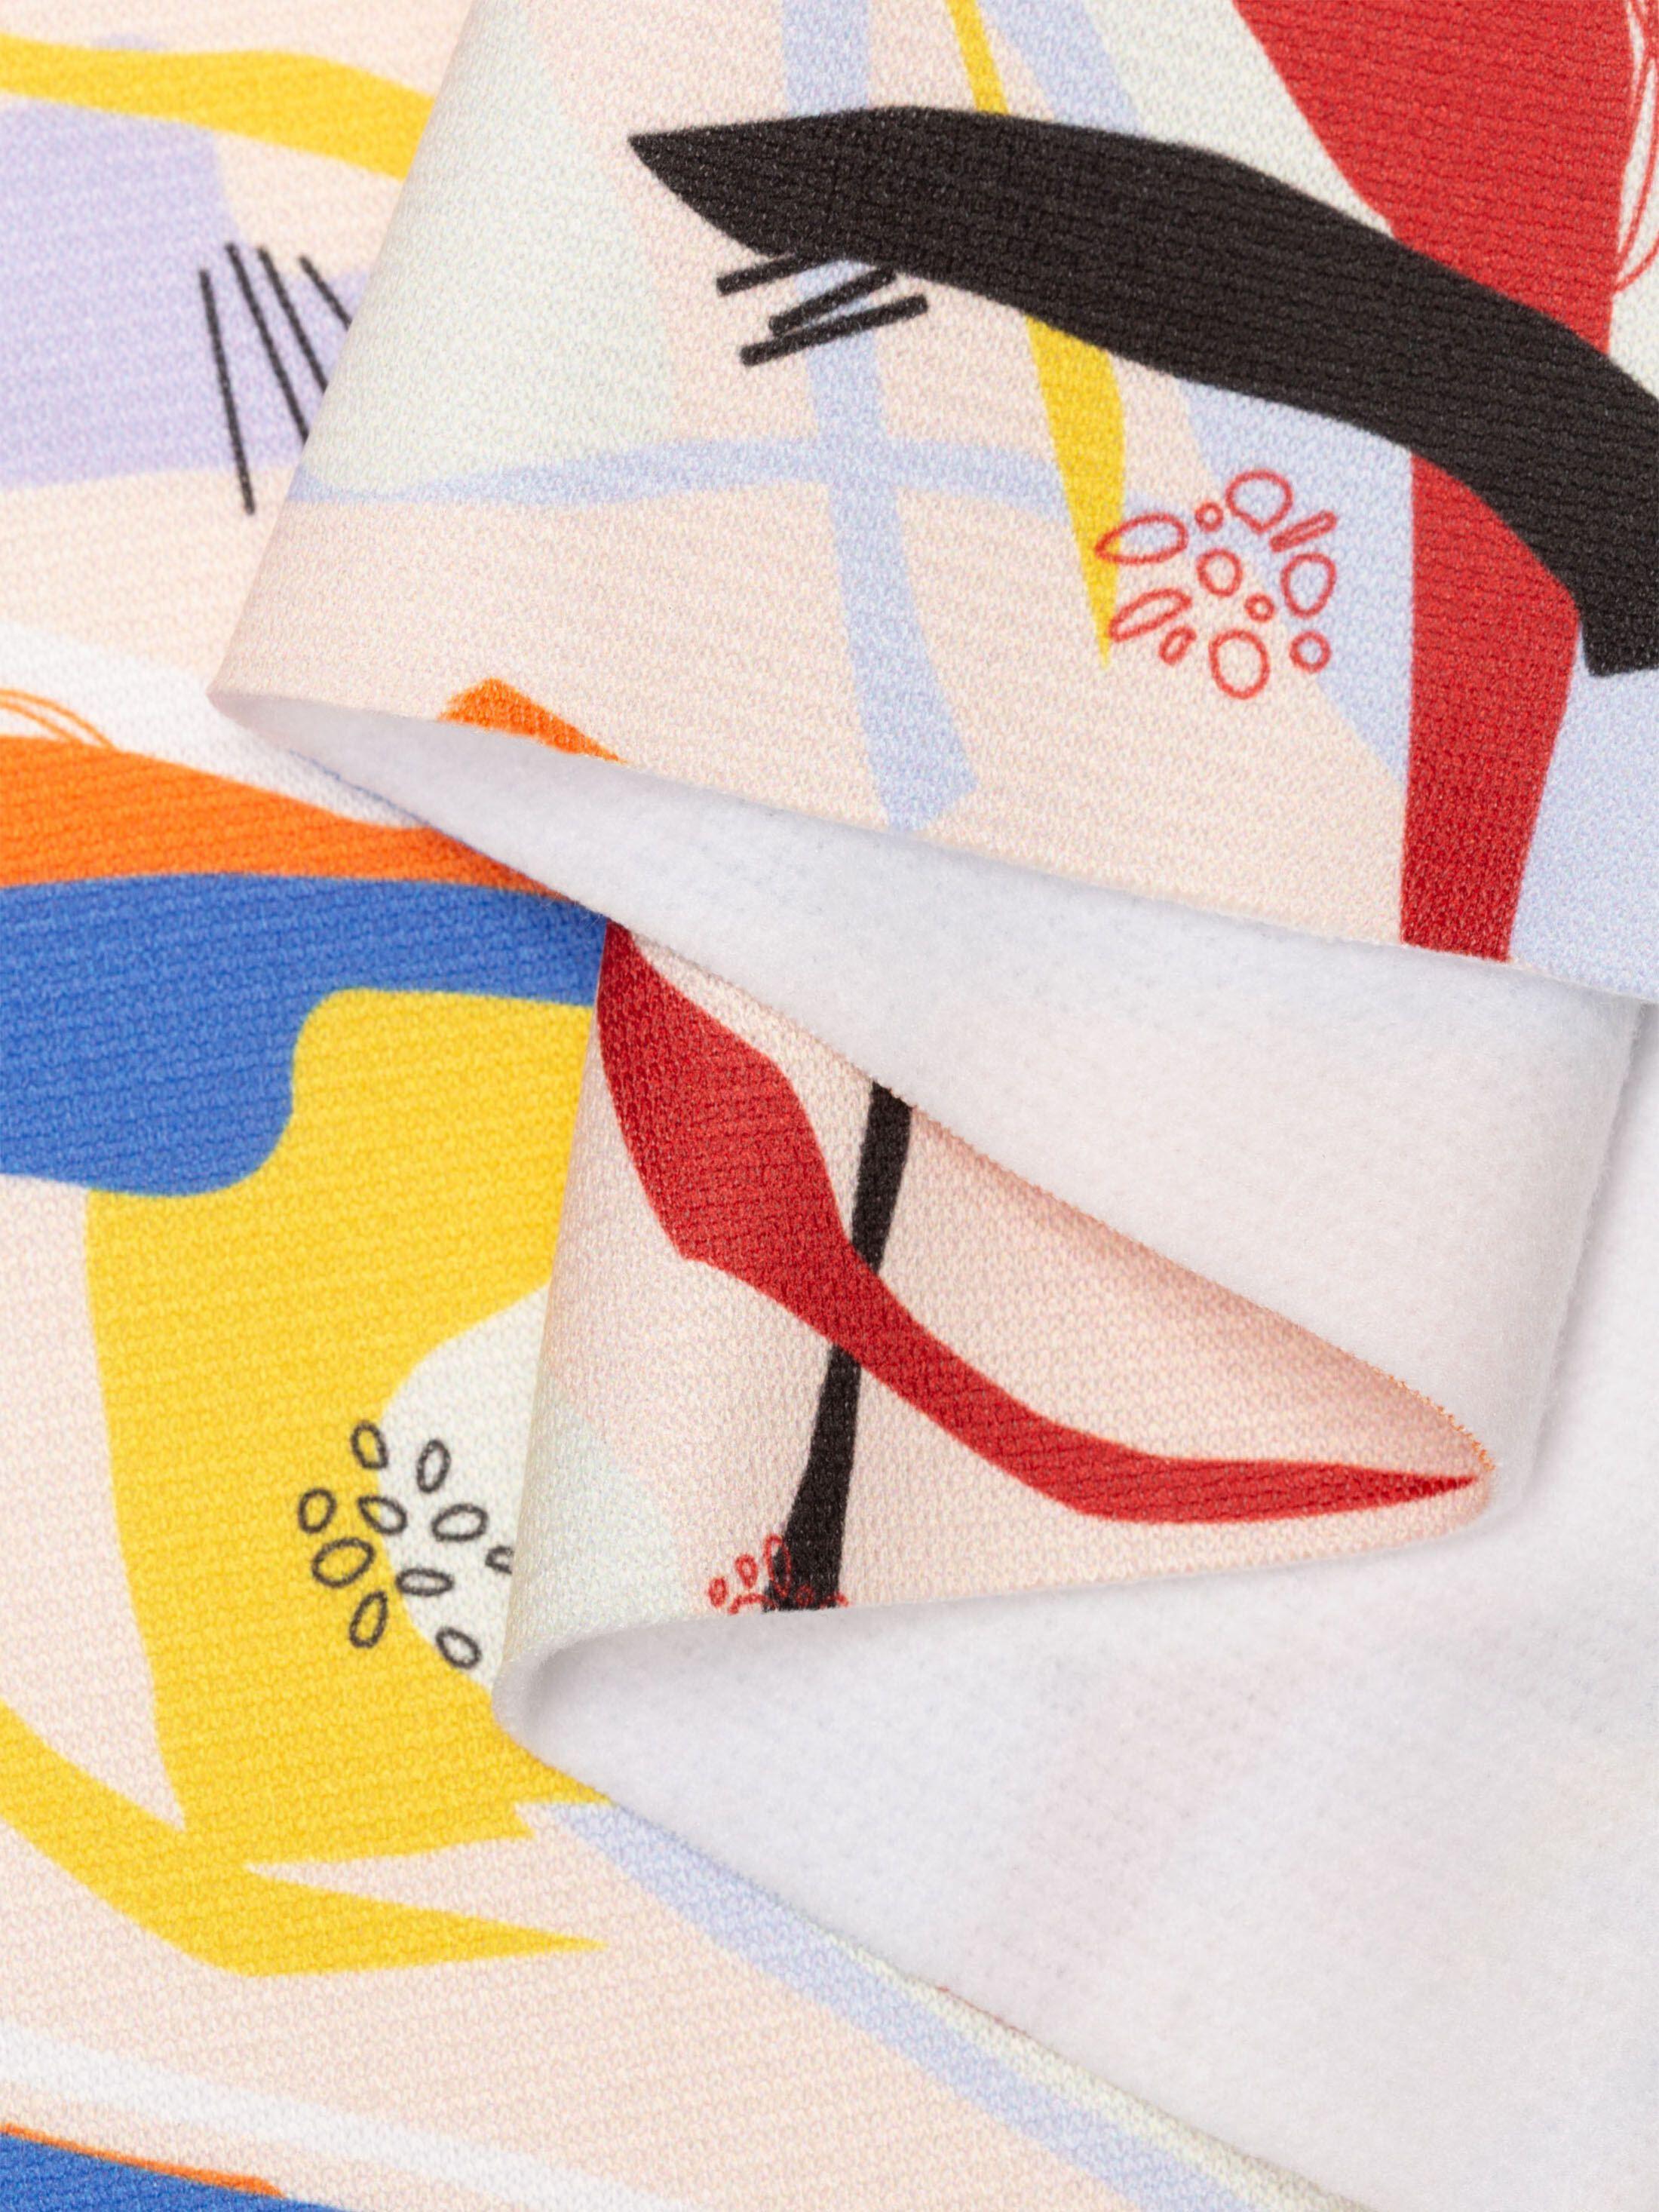 small run printing heavy cotton jersey edge options